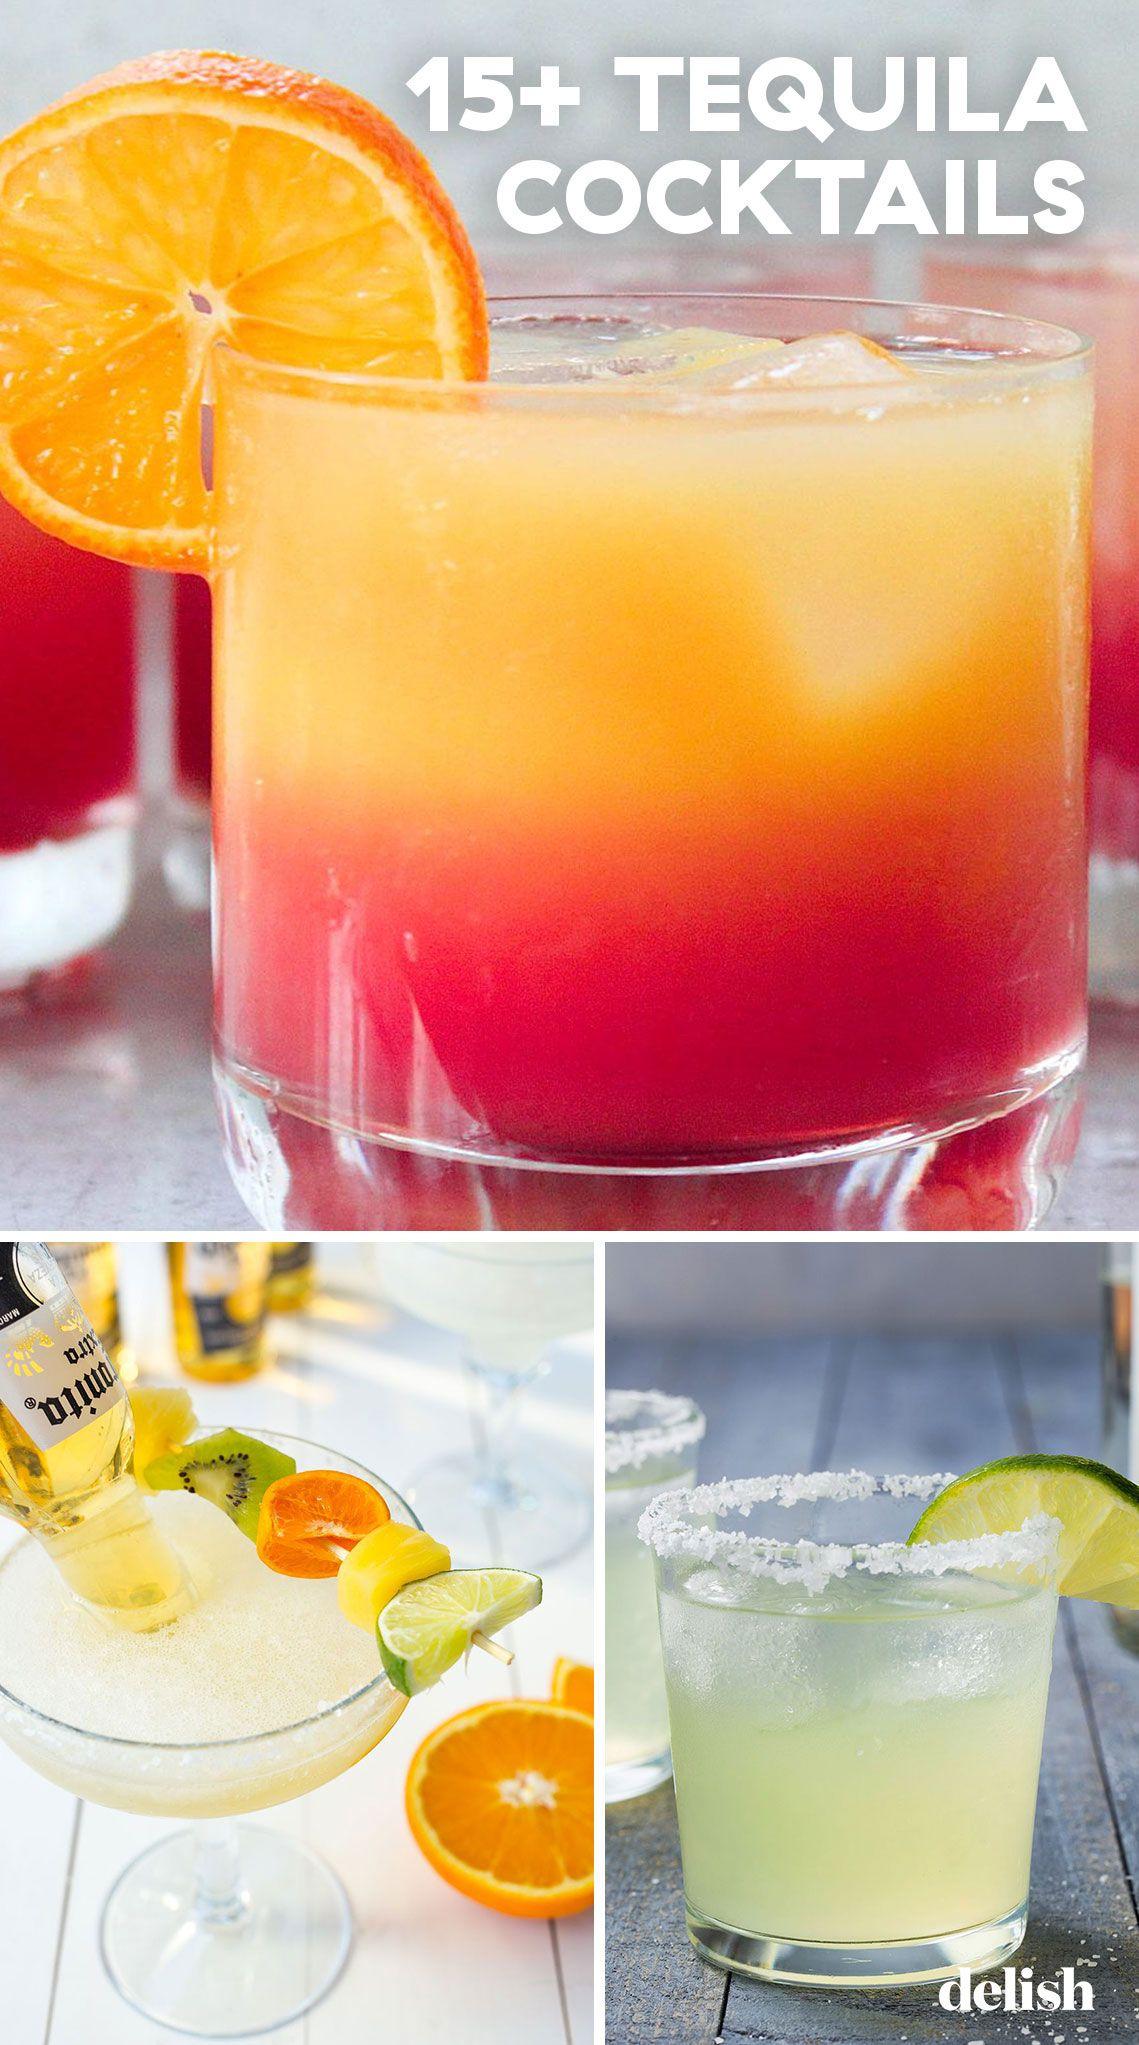 15+ Tequila Cocktails #tequiladrinks